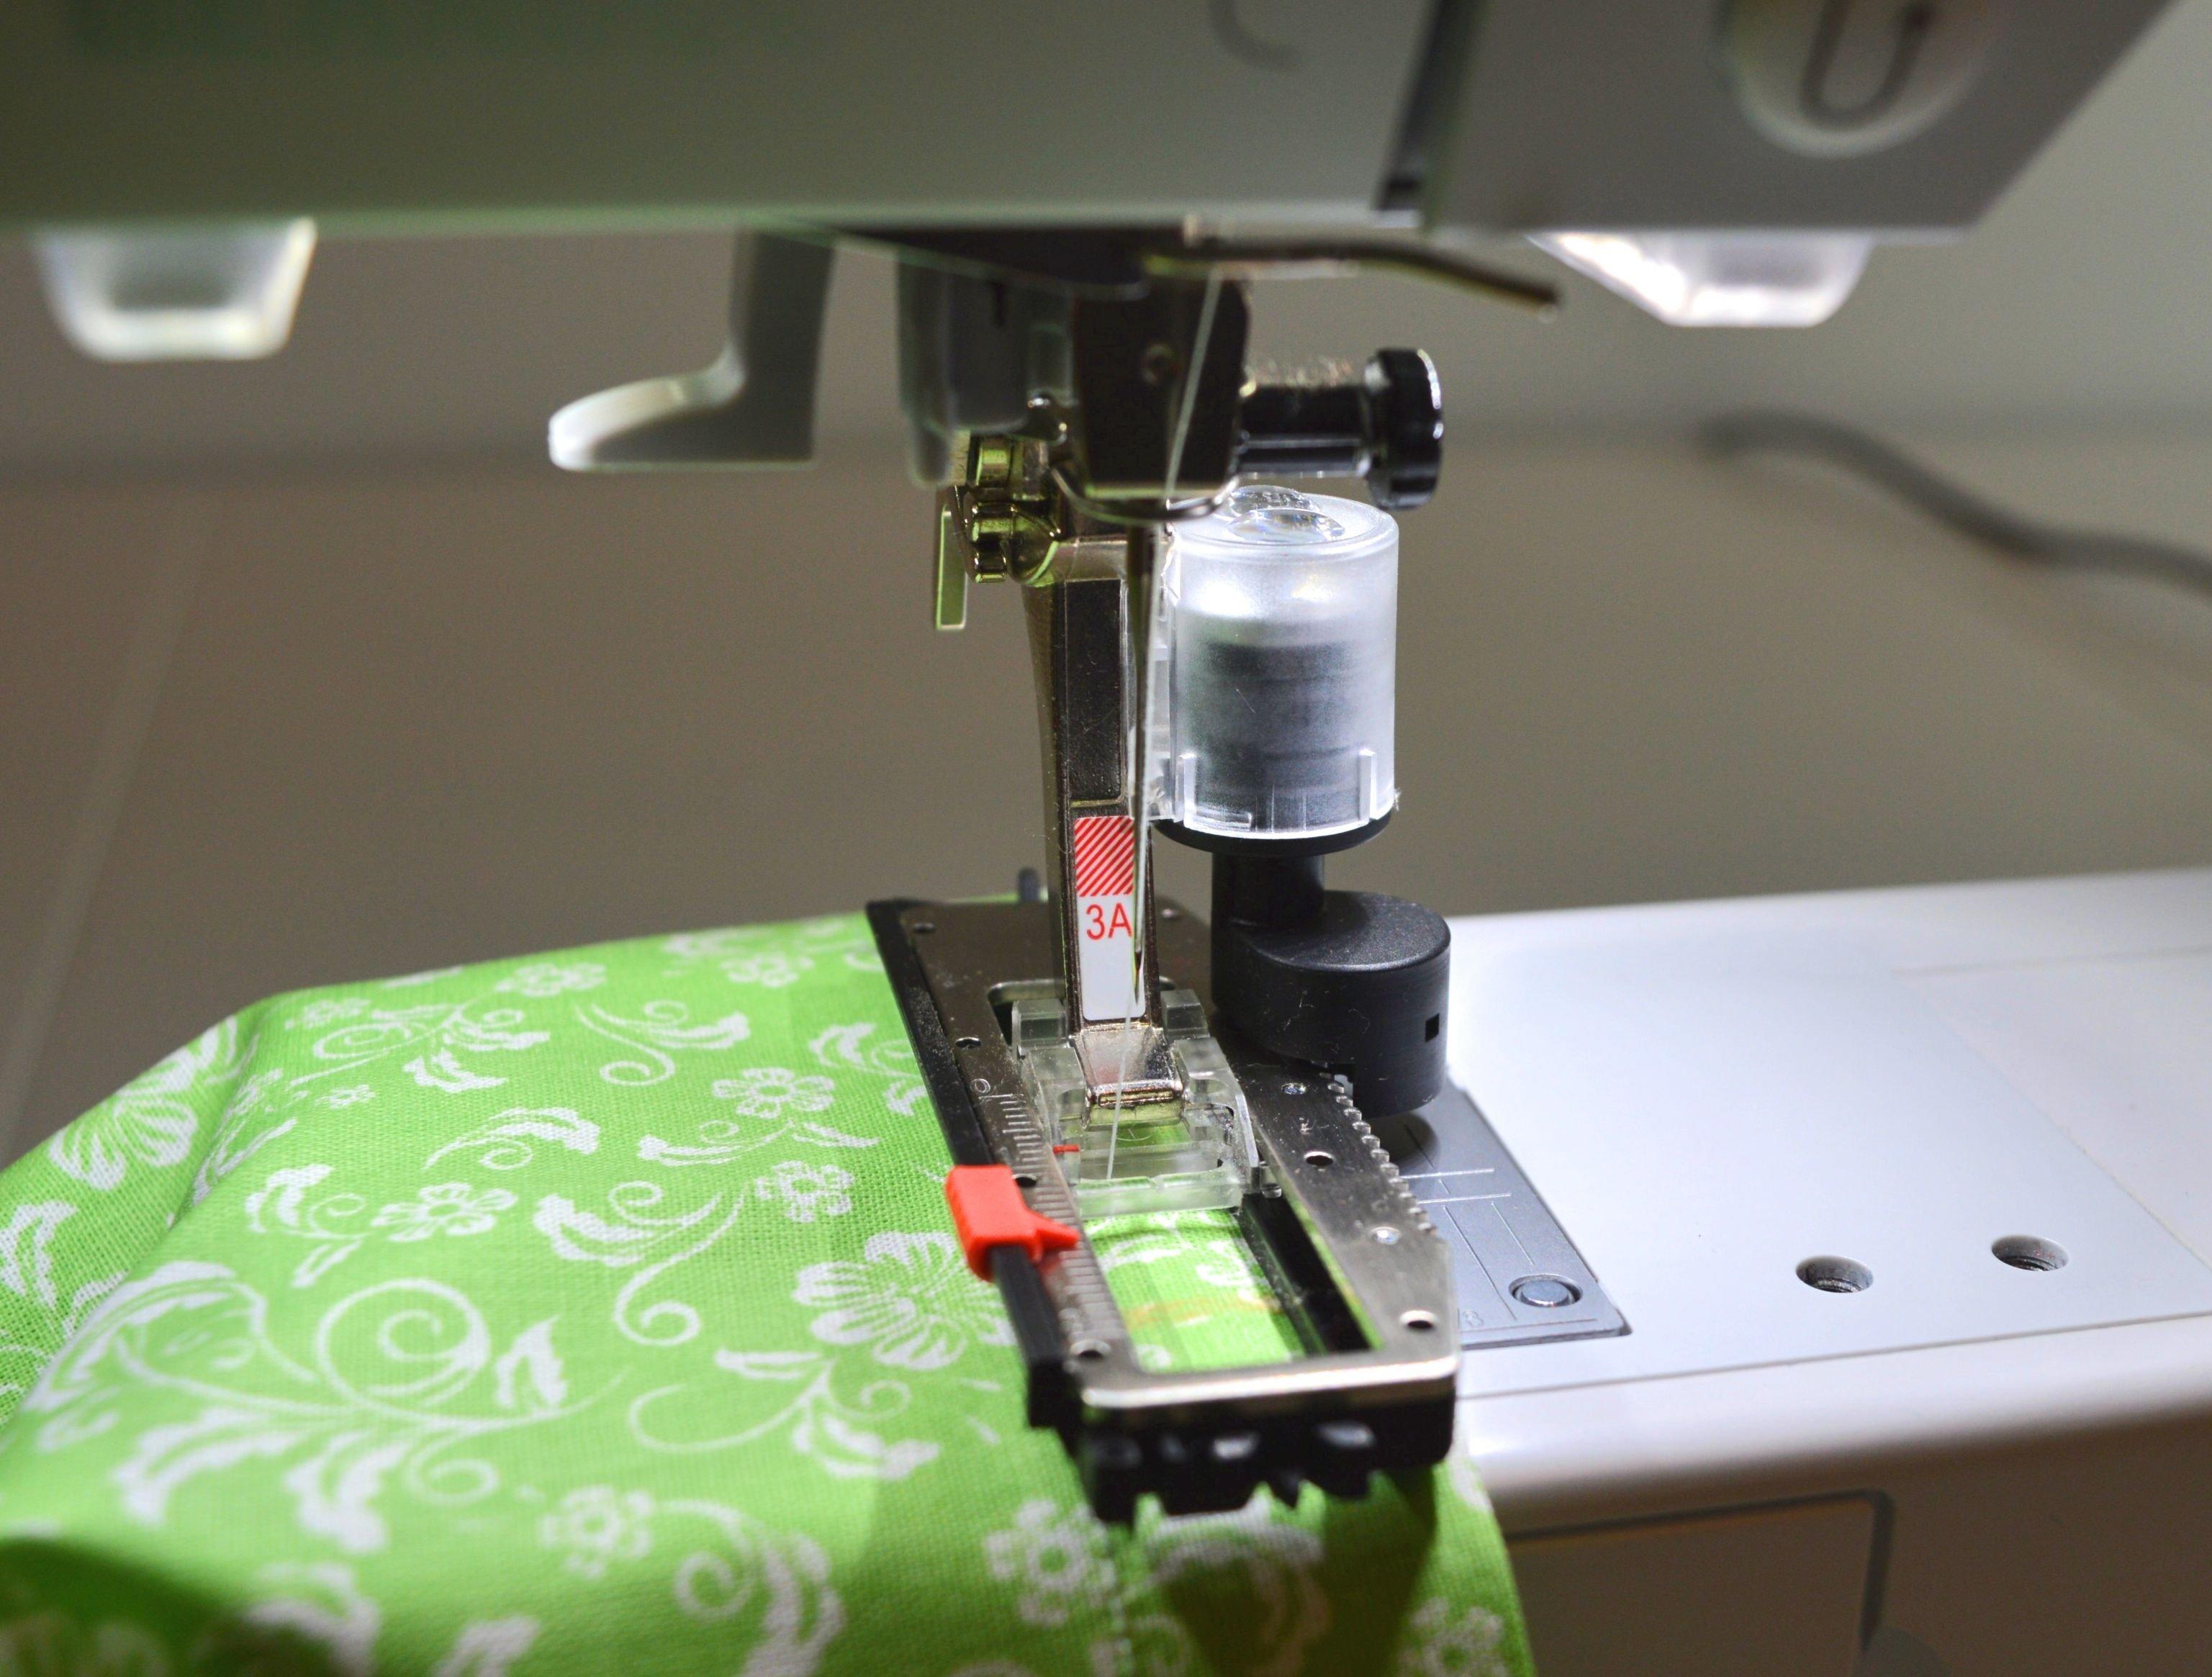 Sewing pillowcase